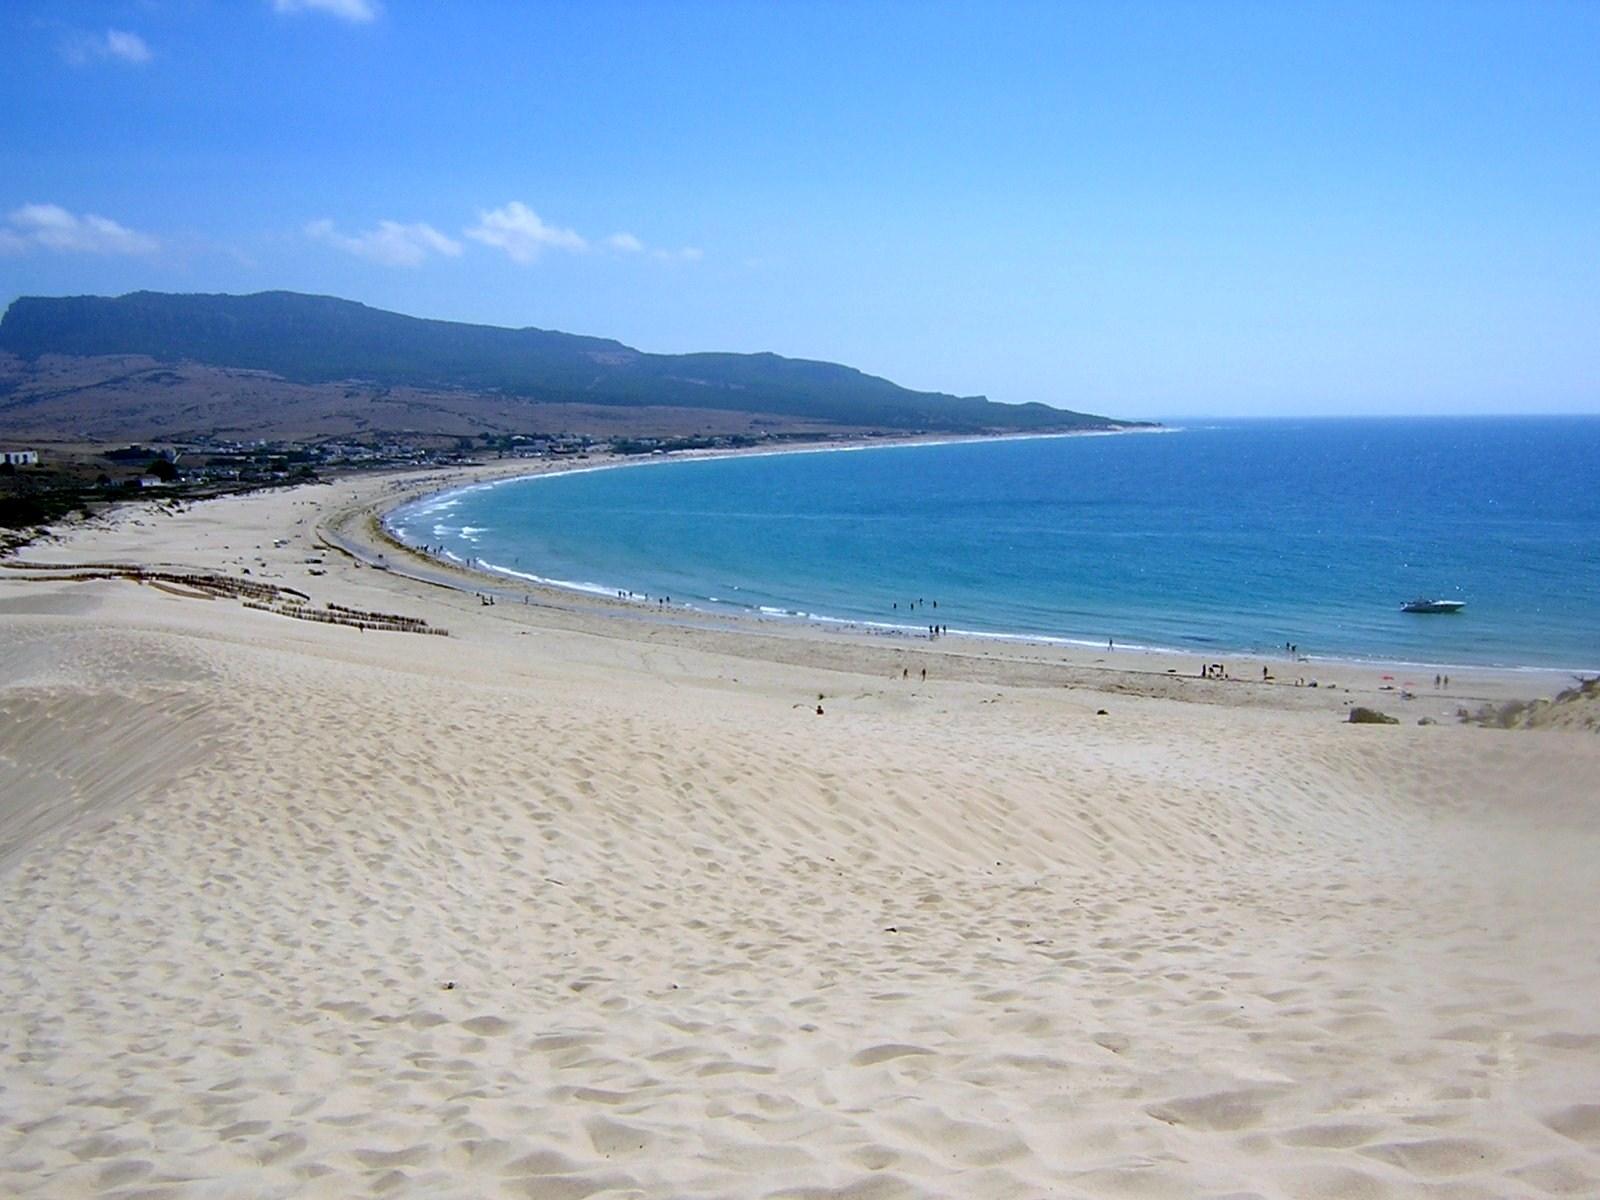 SPAIN NOW WALKING: Bologna beach (Cadiz - Spain)